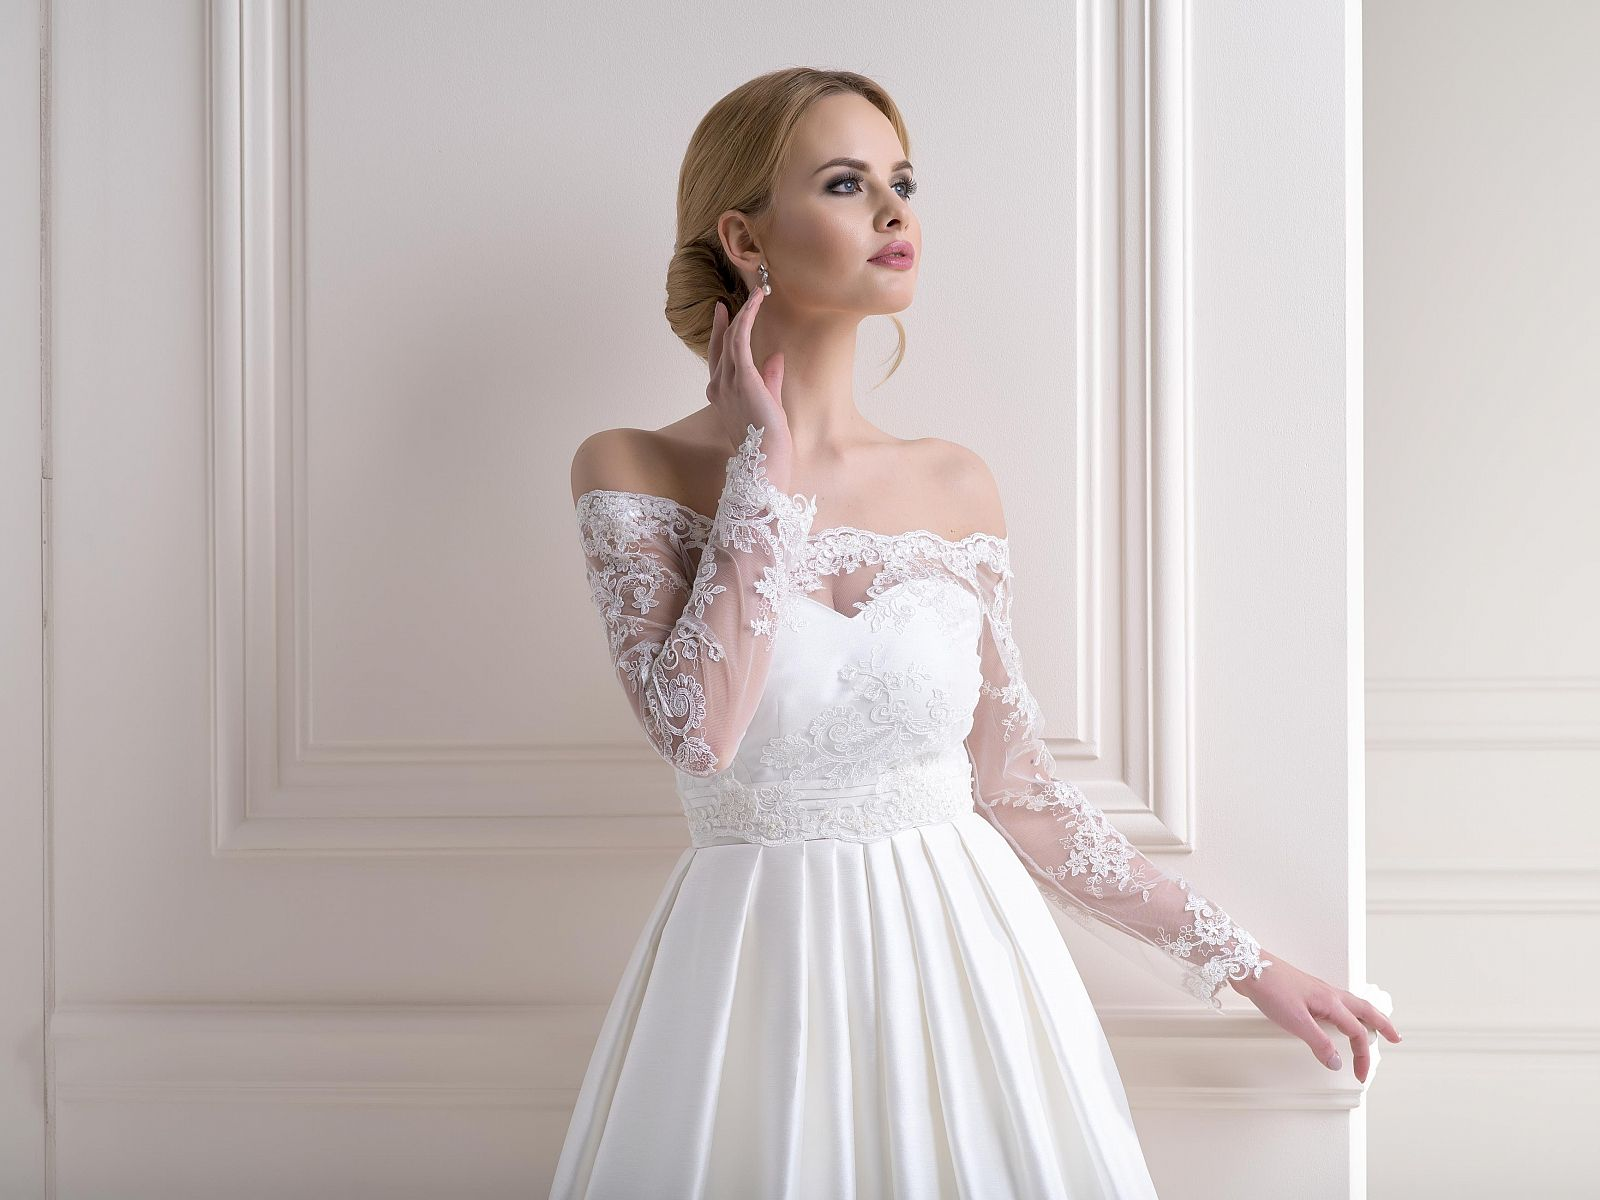 Long sleeve bardot wedding dress insured fashion for Long sleeve wedding dress topper